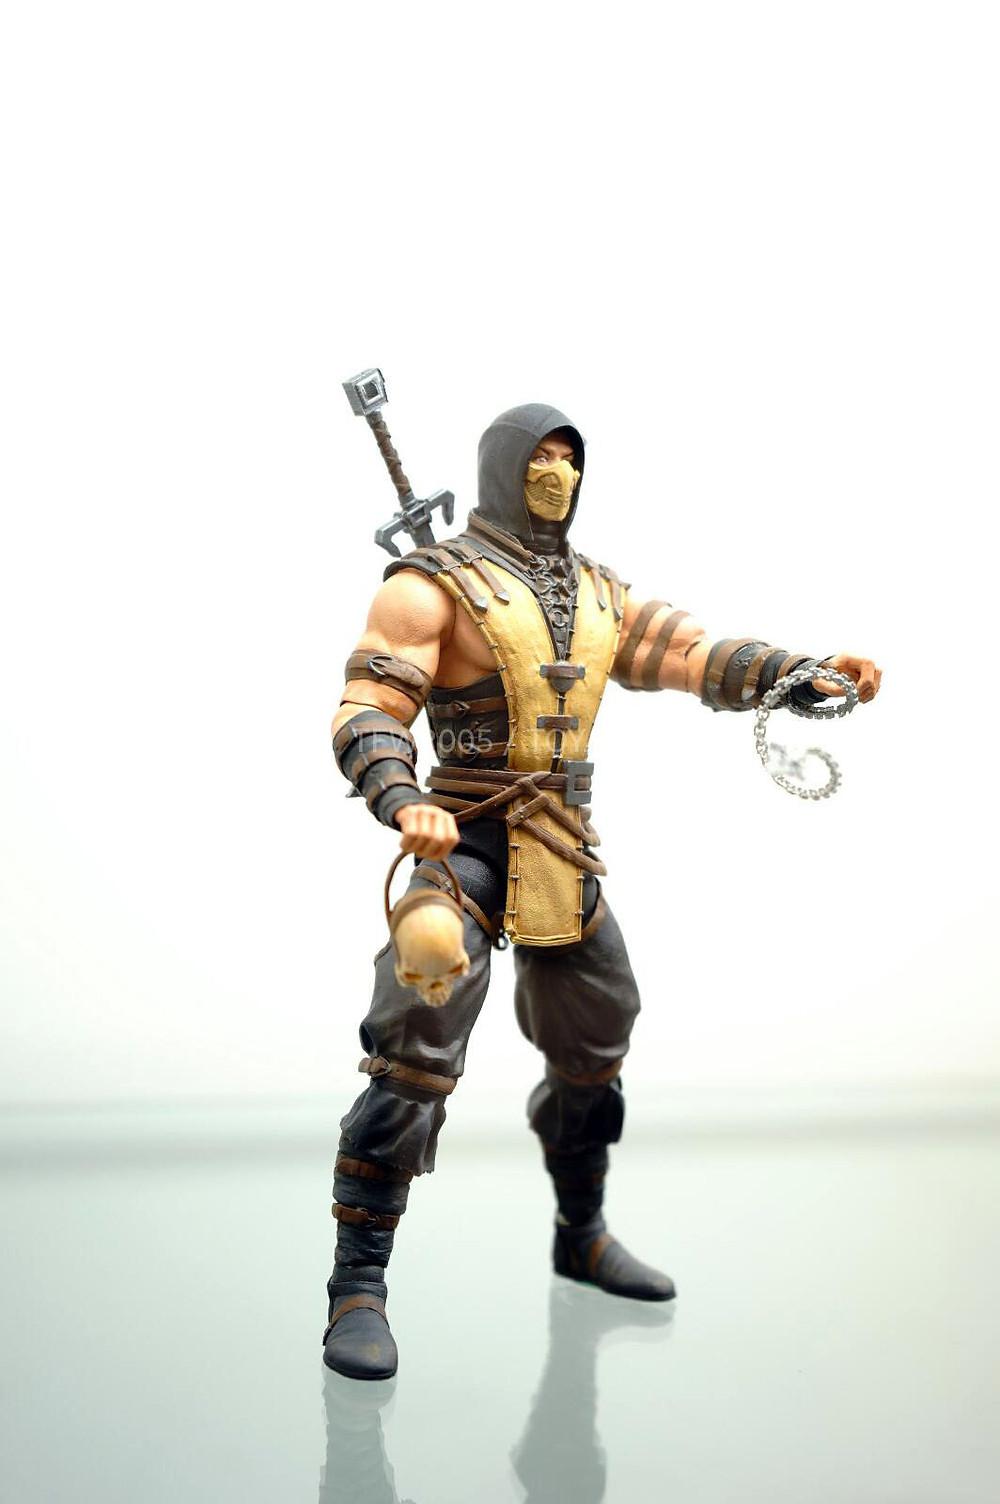 NYCC-2014-Mezco-Mortal-Kombat-X-008.jpg